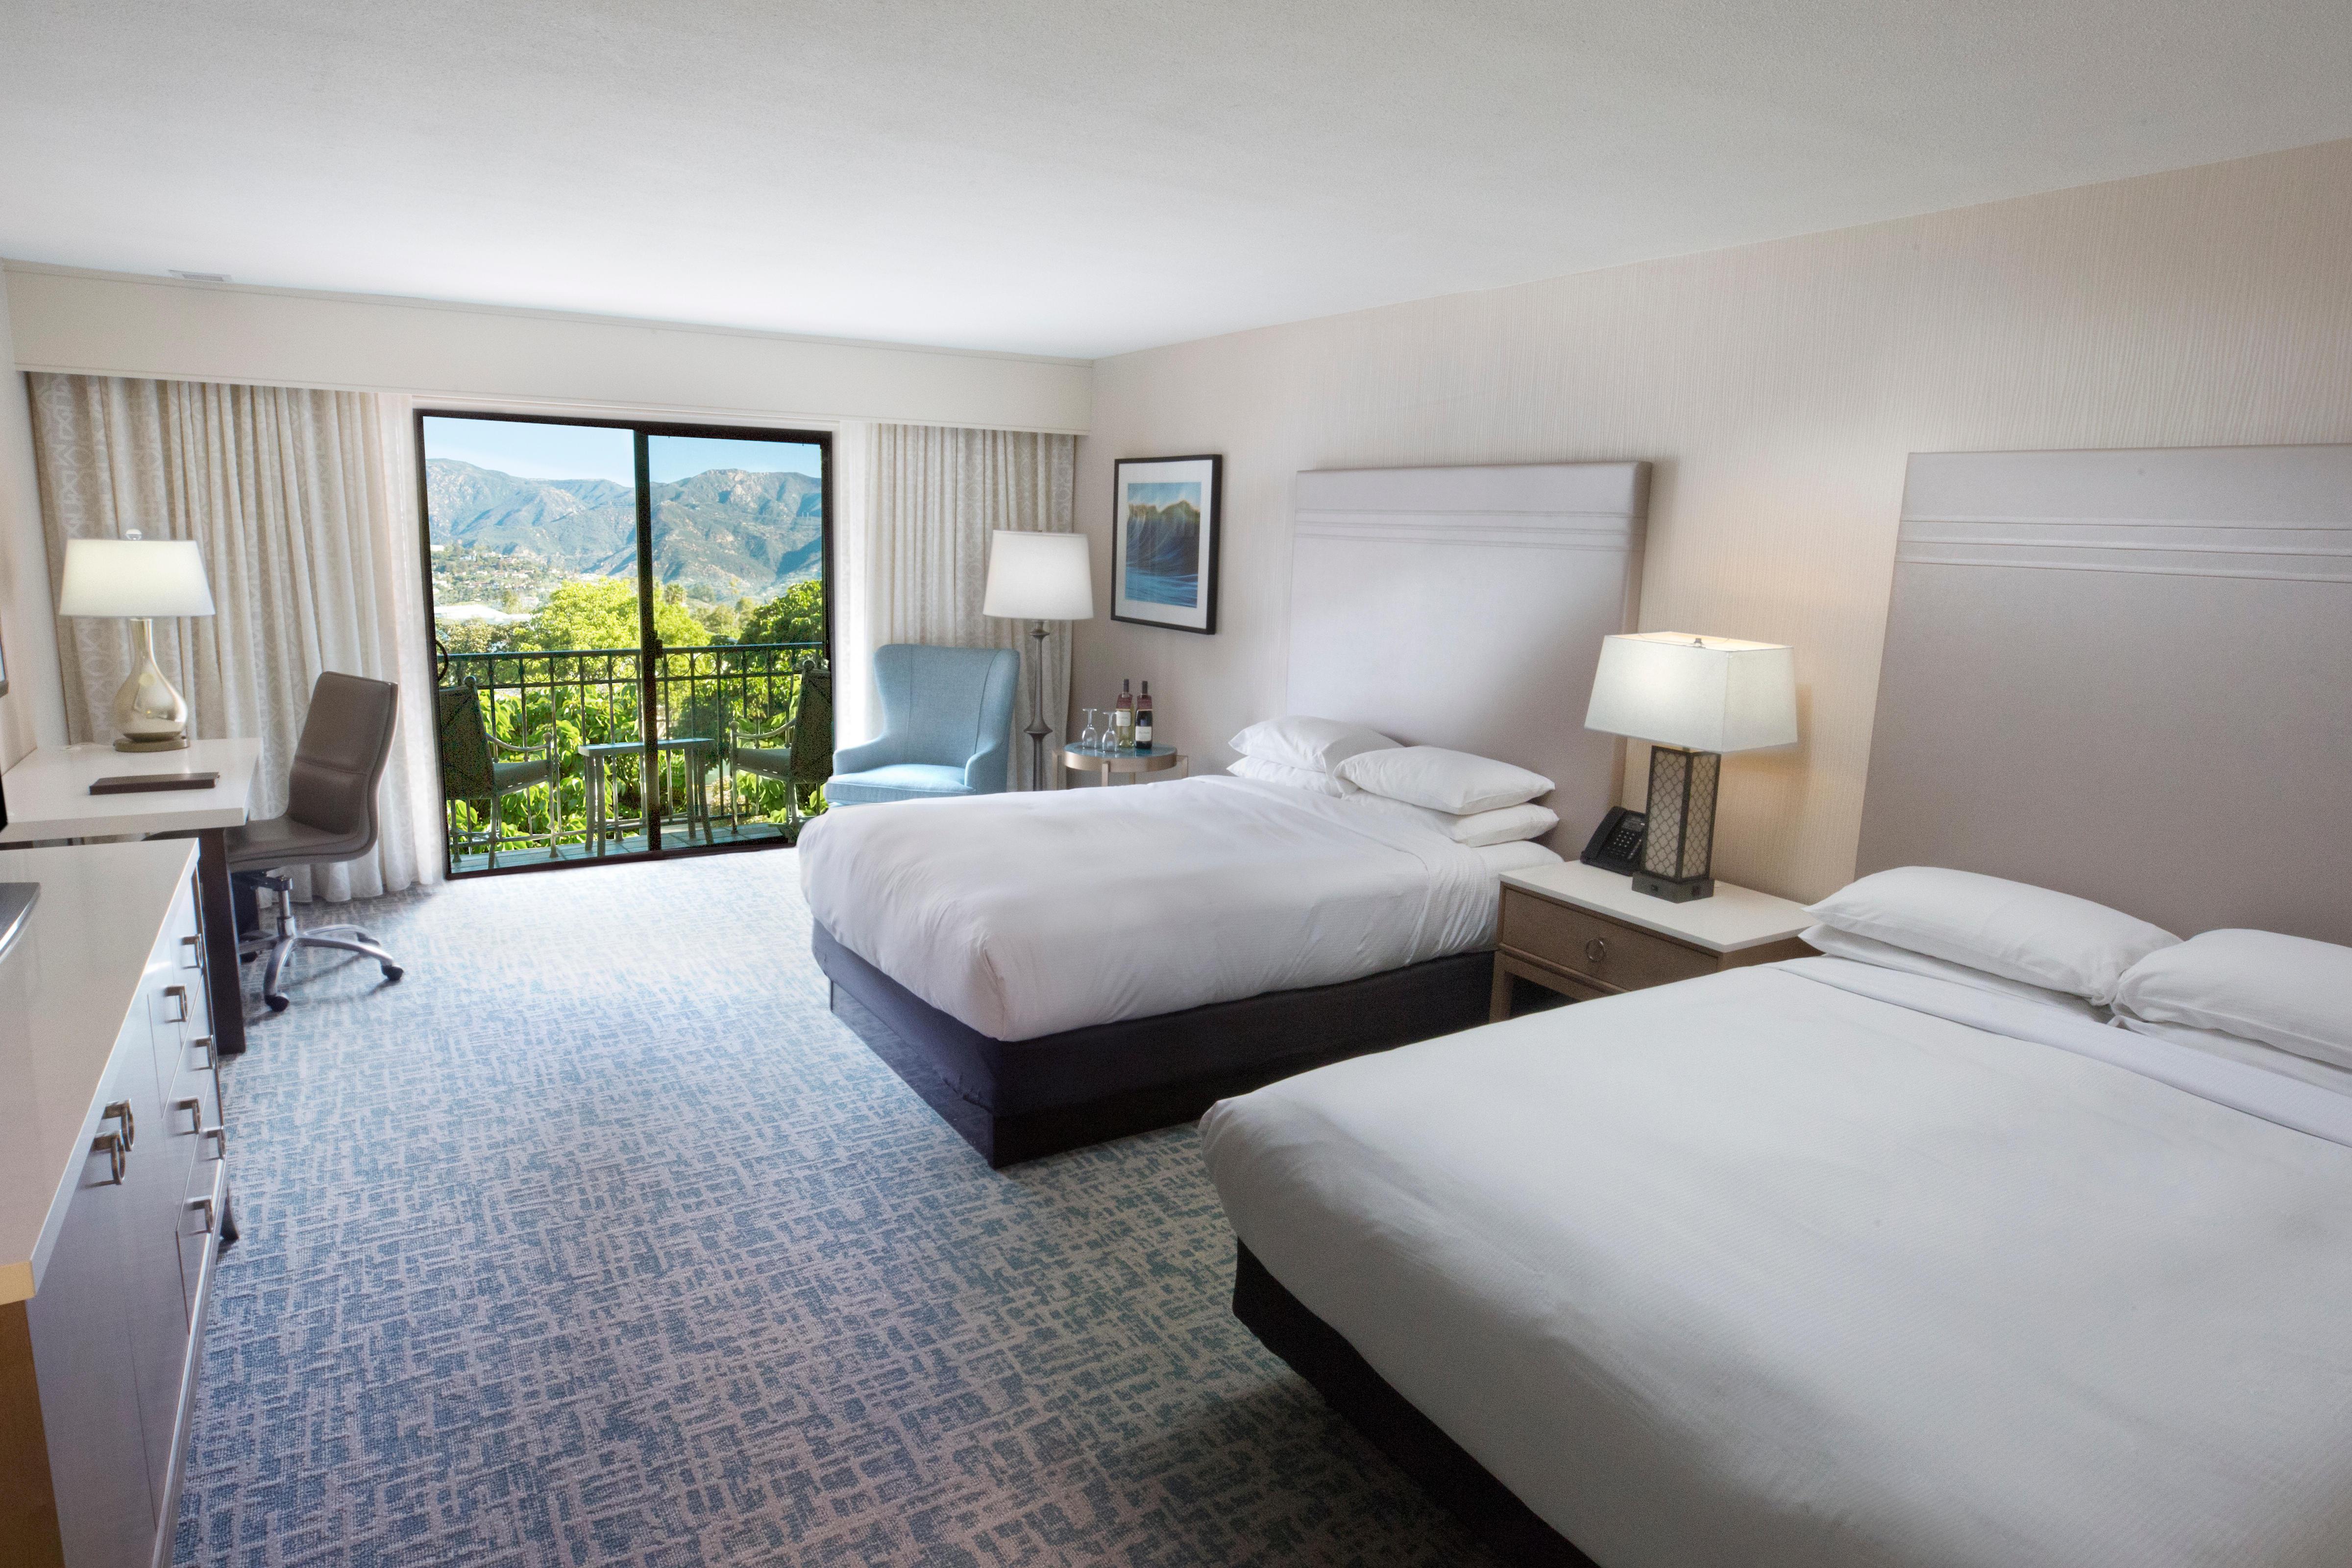 Santa Barbara Hotels With Conference Rooms